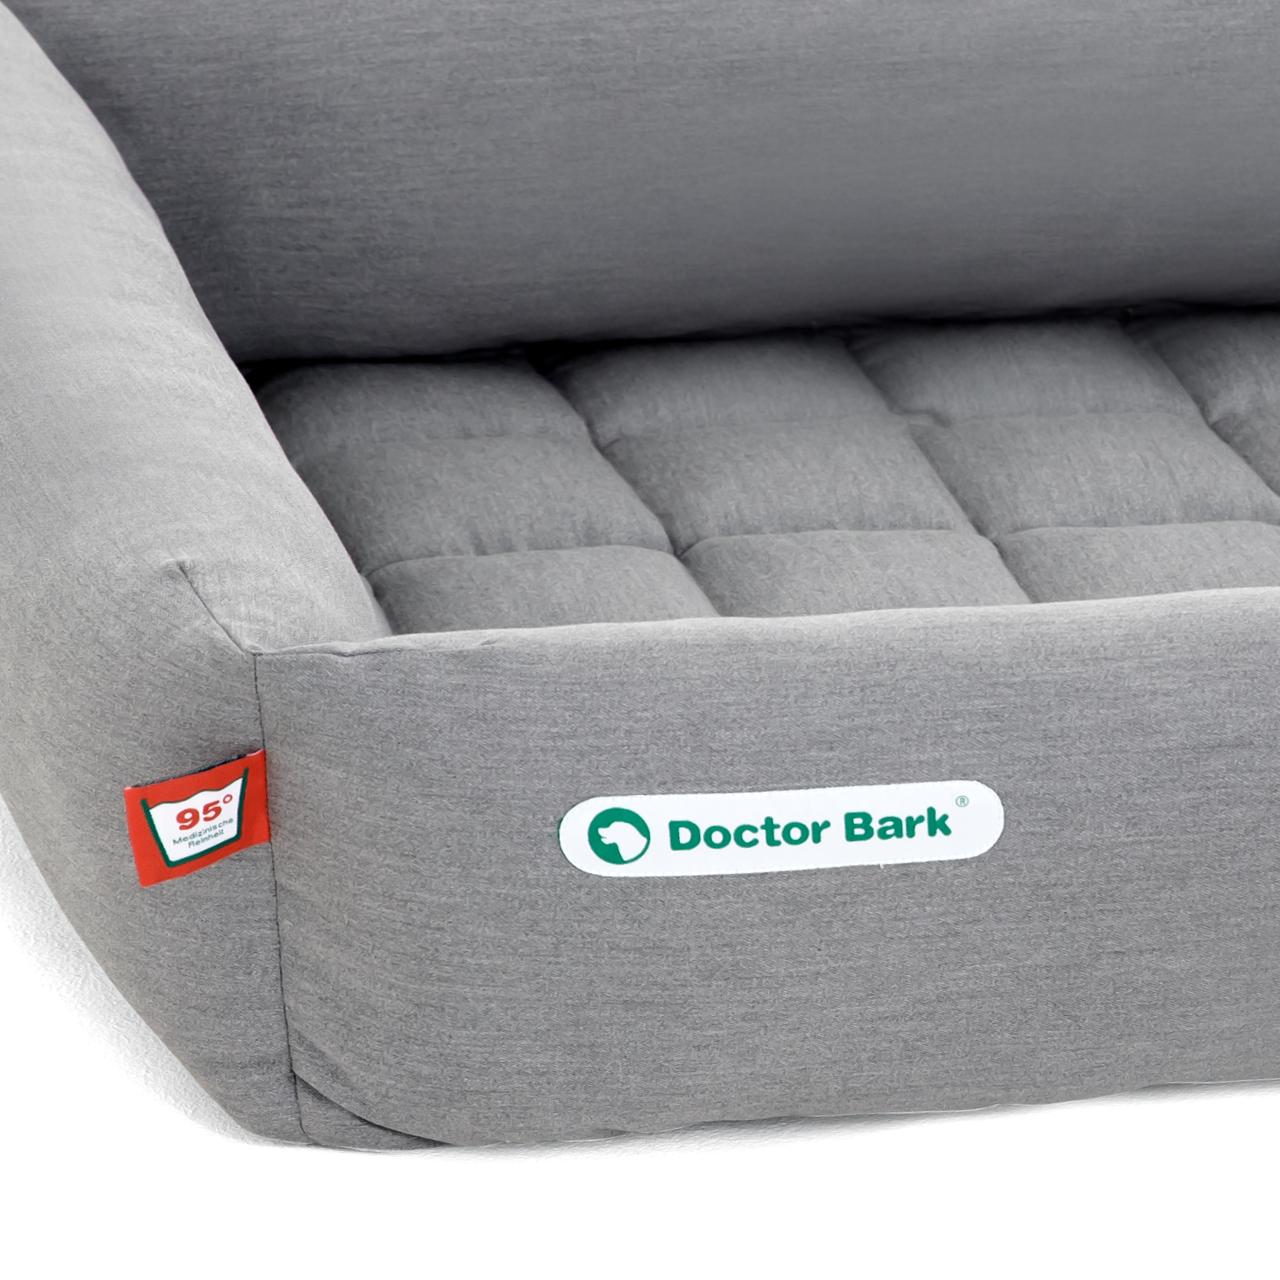 SET Bett + Einlegedecke hellgrau XL